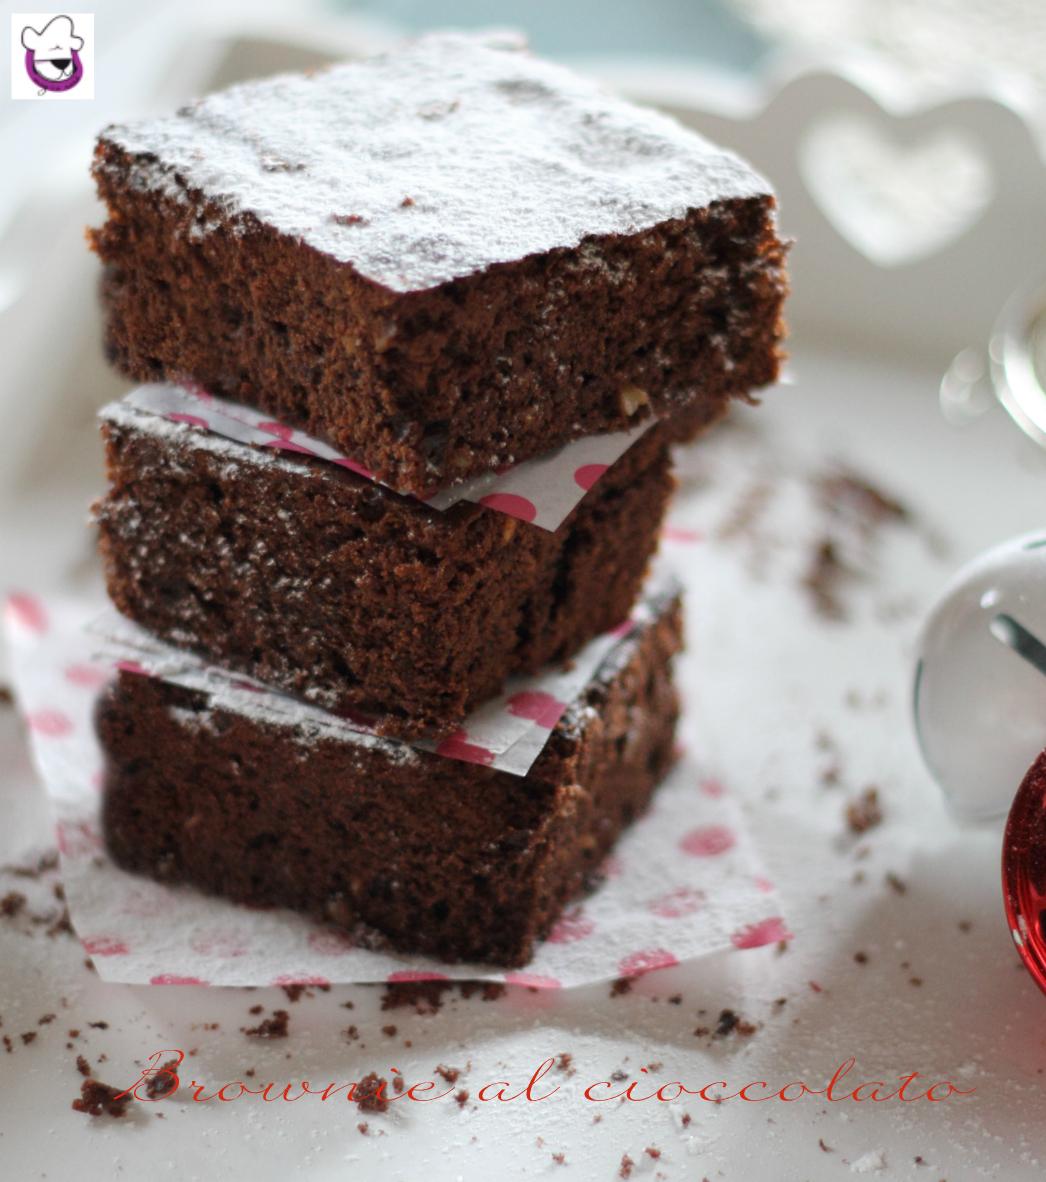 Ricetta Brownies Bimby Senza Burro.Ricetta Brownie Al Cioccolato Ricetta Con E Senza Bimby